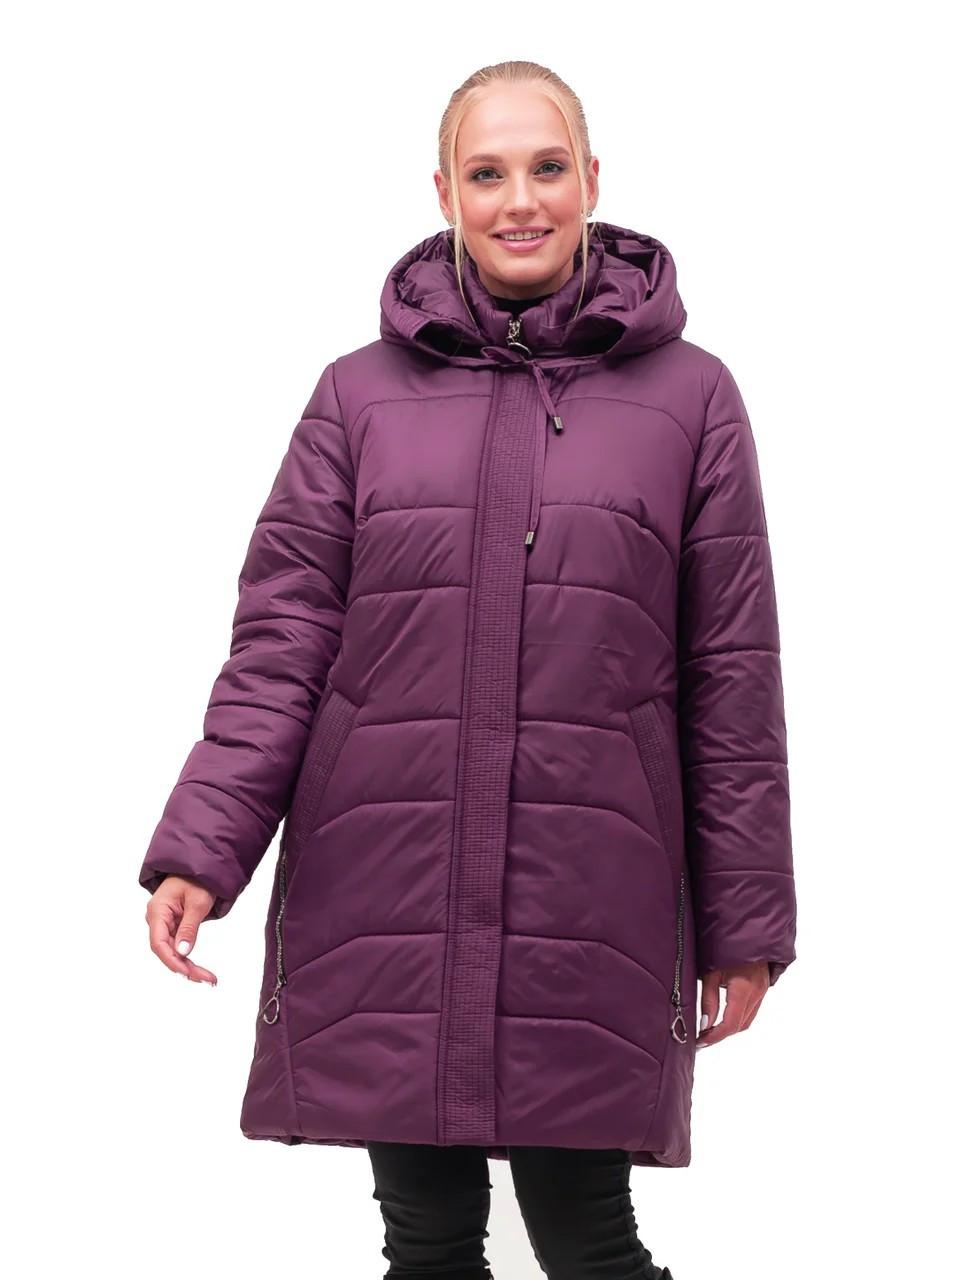 Зимняя стёганная  женская куртка батал цвета марсал с 54 по 70 размер